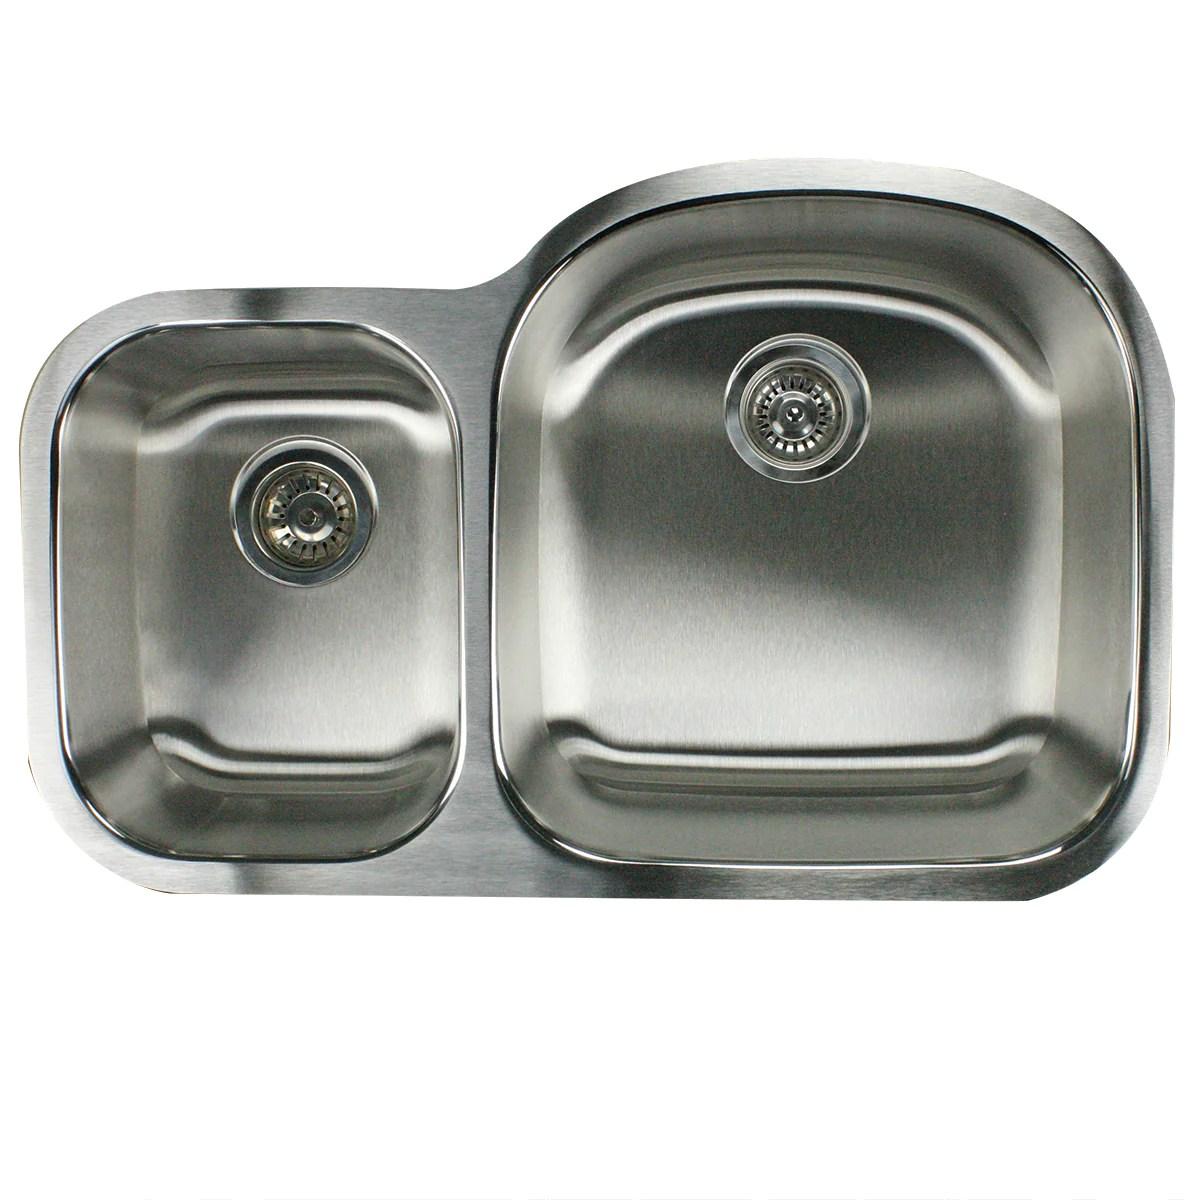 nantucket sinks ns7030 16 32 5 70 30 reverse double bowl undermount stainless steel kitchen sink 16 gauge